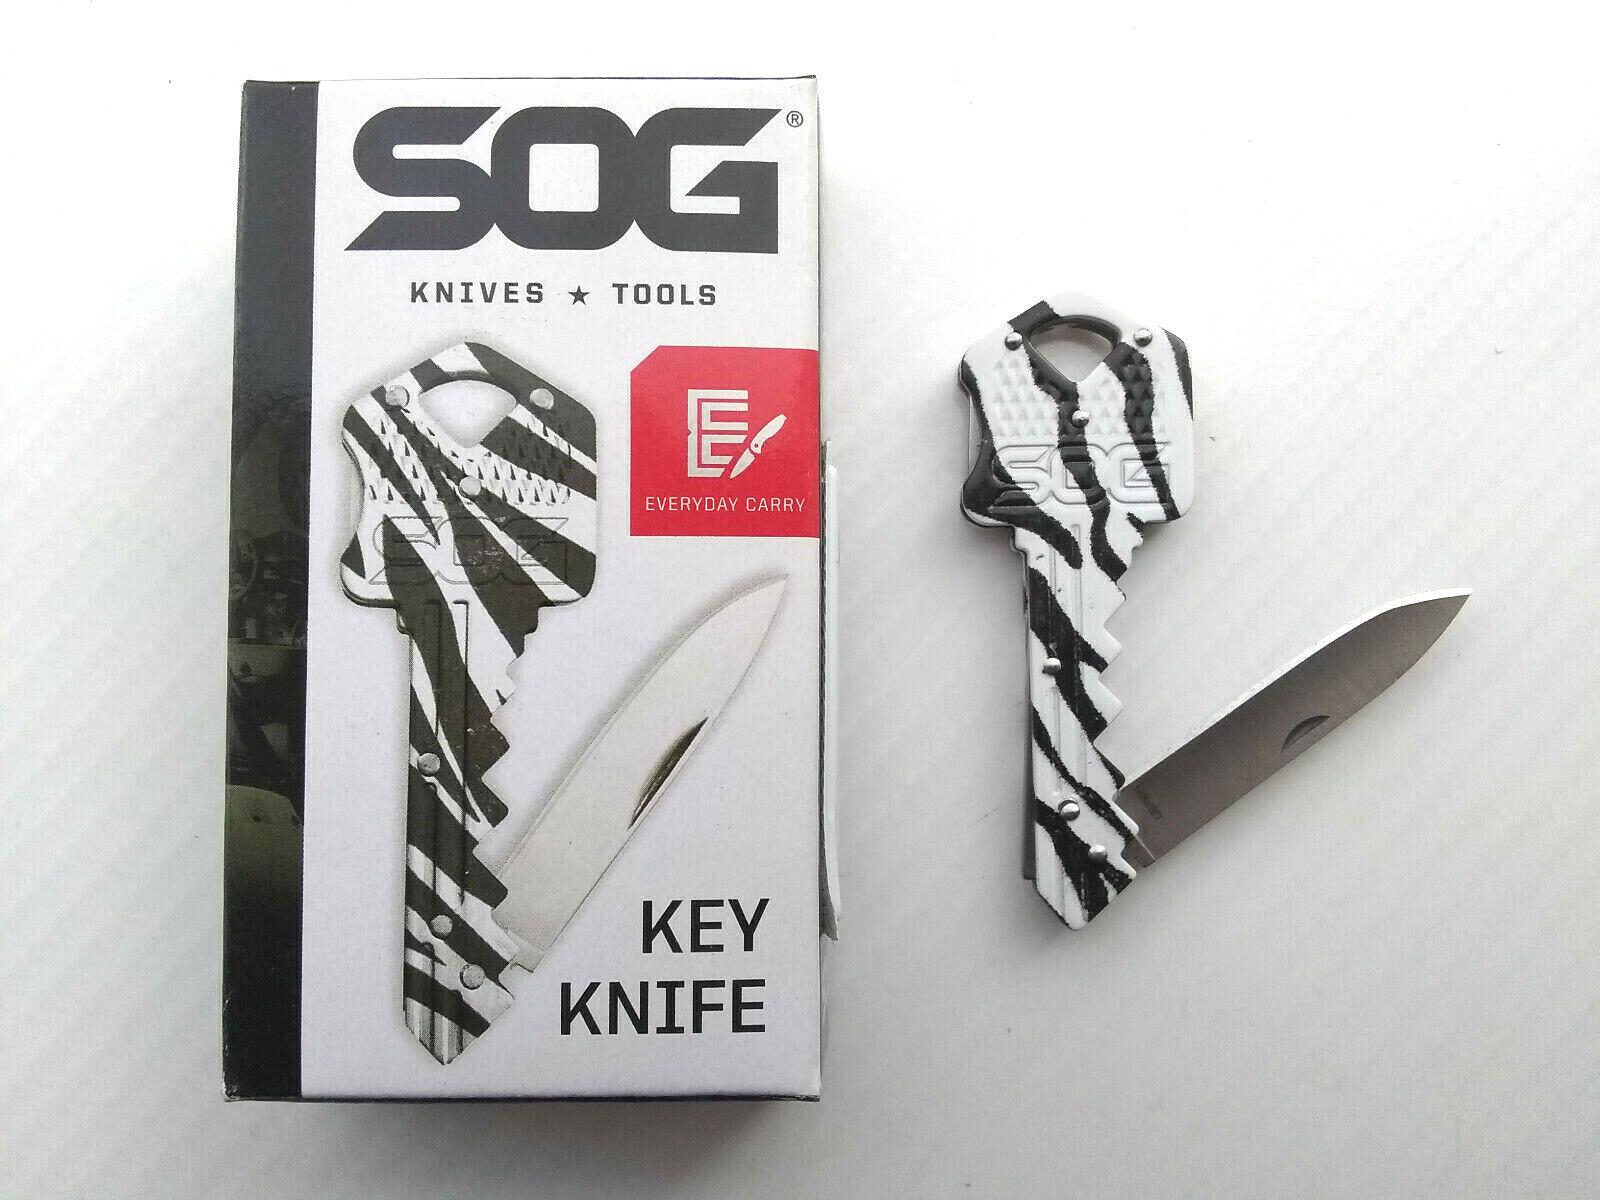 SOG Womens Ladies Zebra Folding Key Chain Mini Purse Lockback Blade Pocket Knife EDC